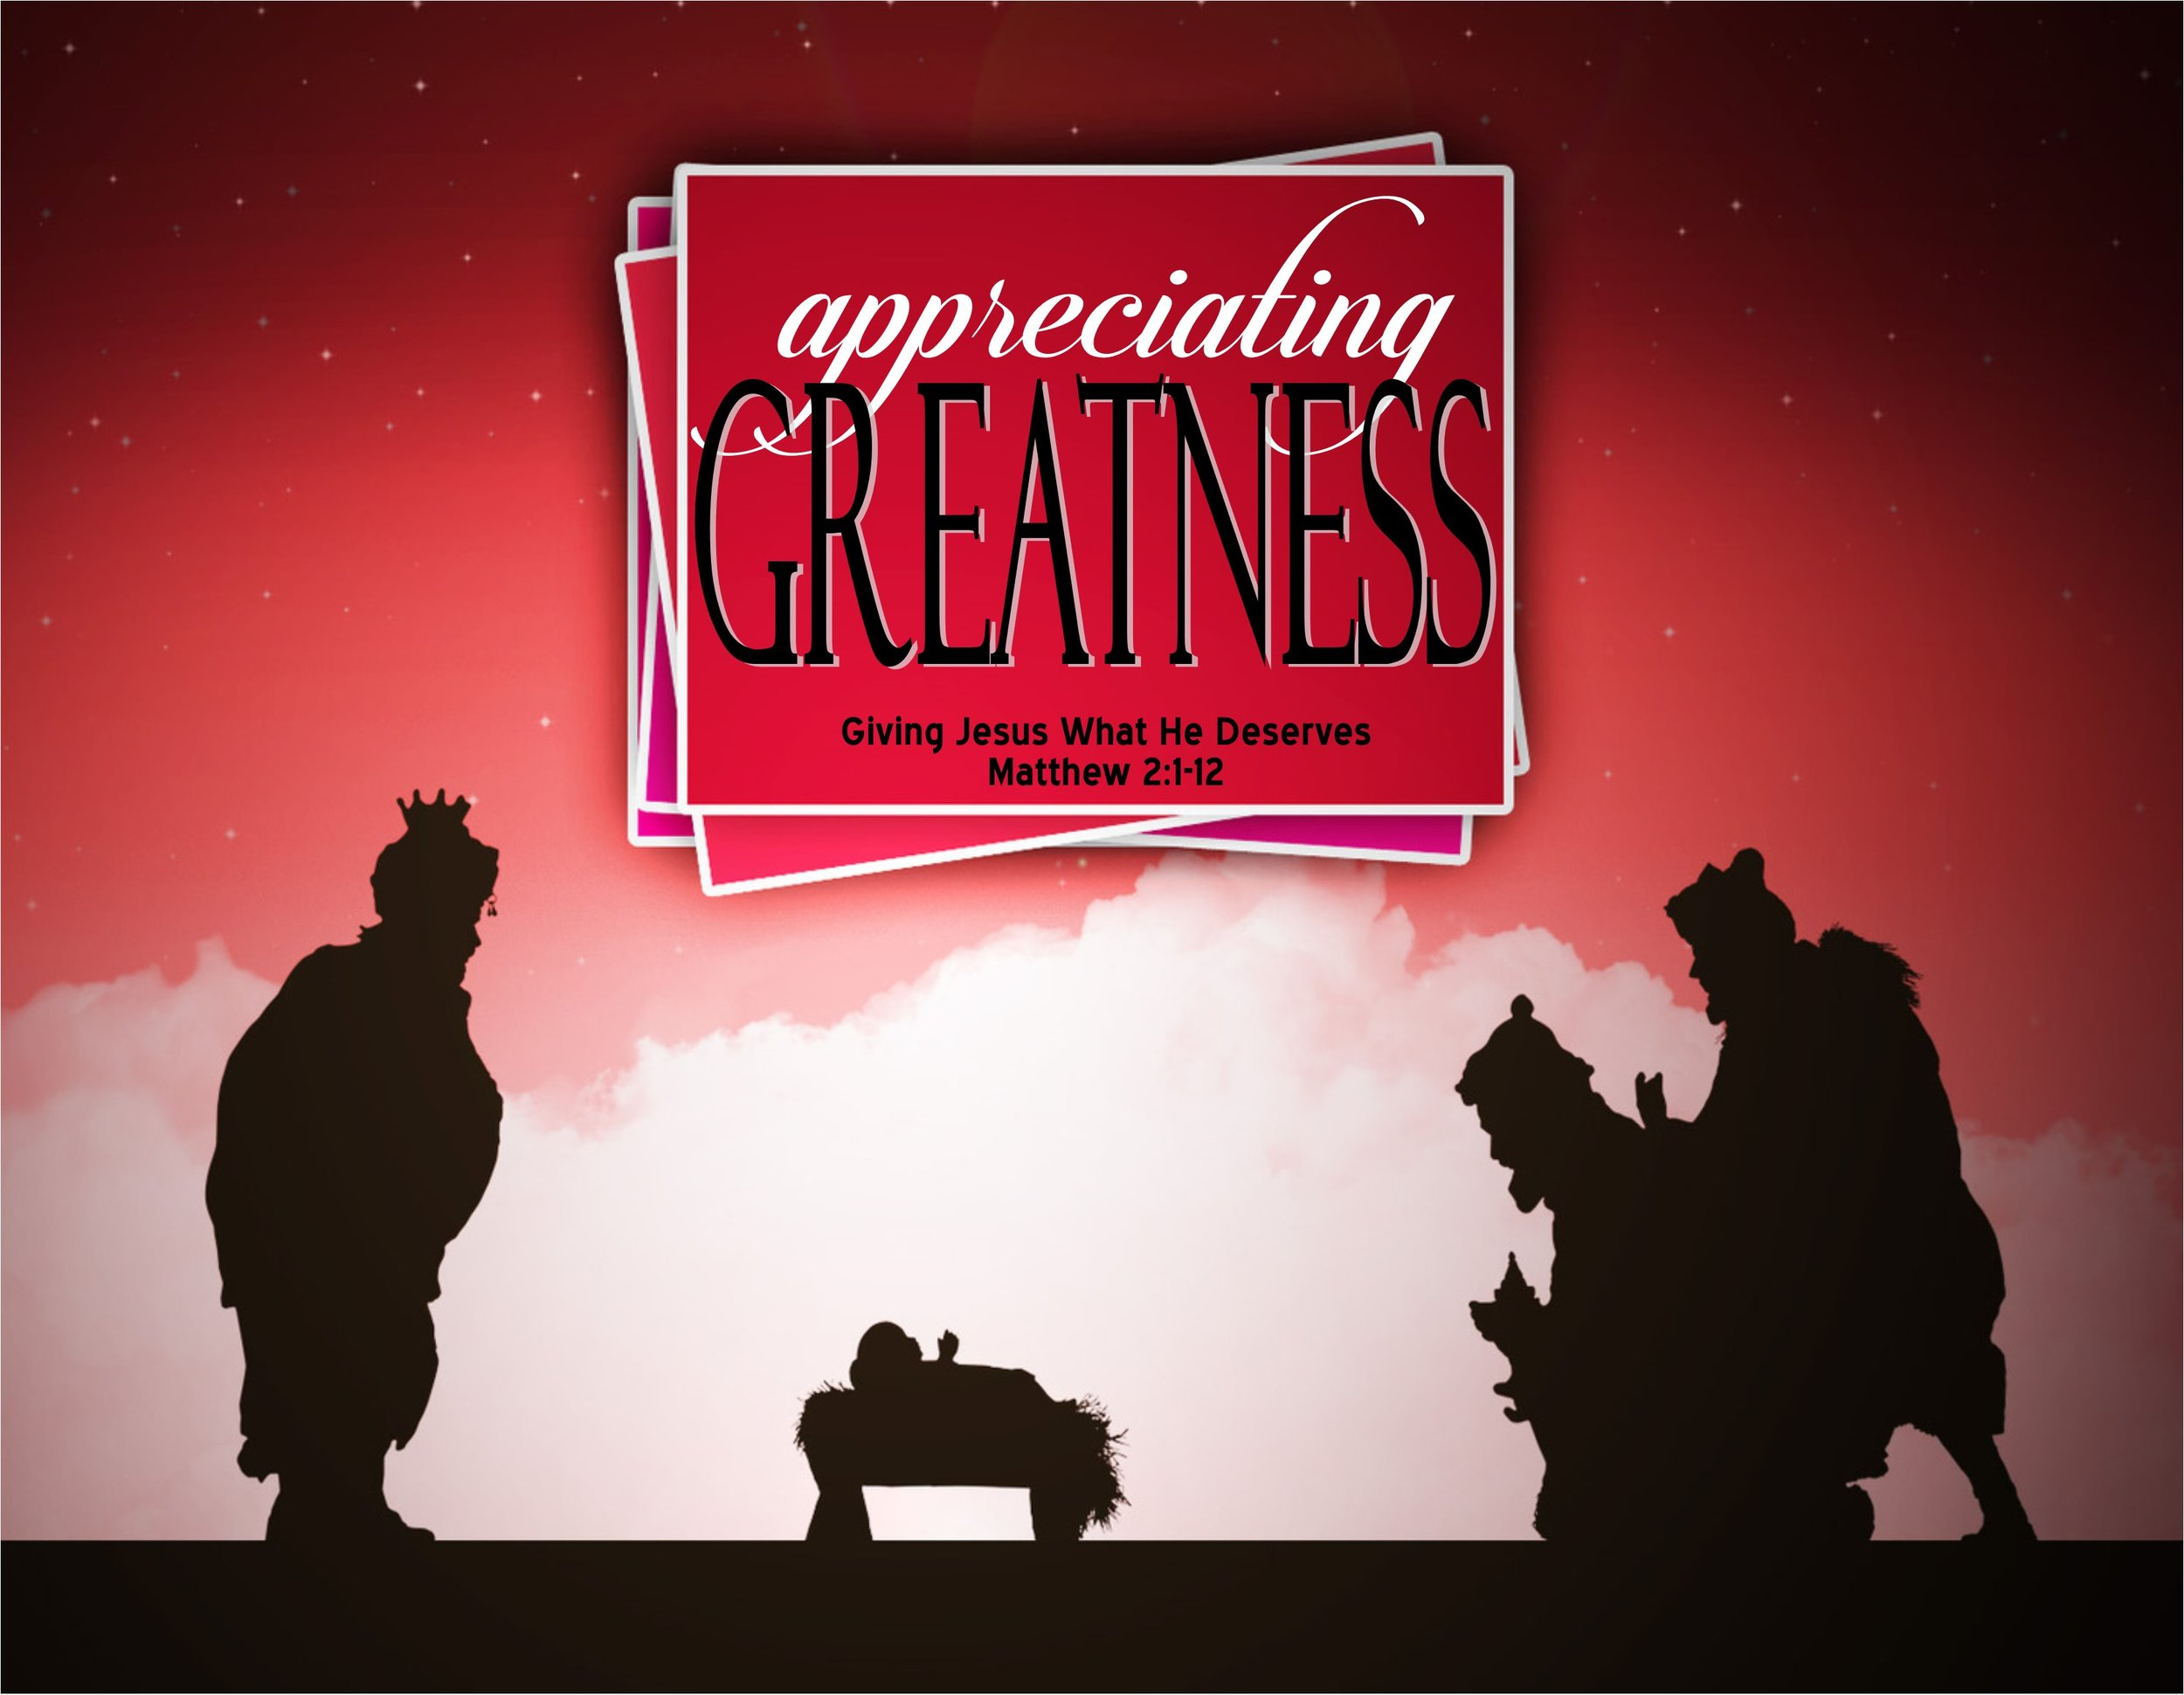 Appreciating Greatness.jpg